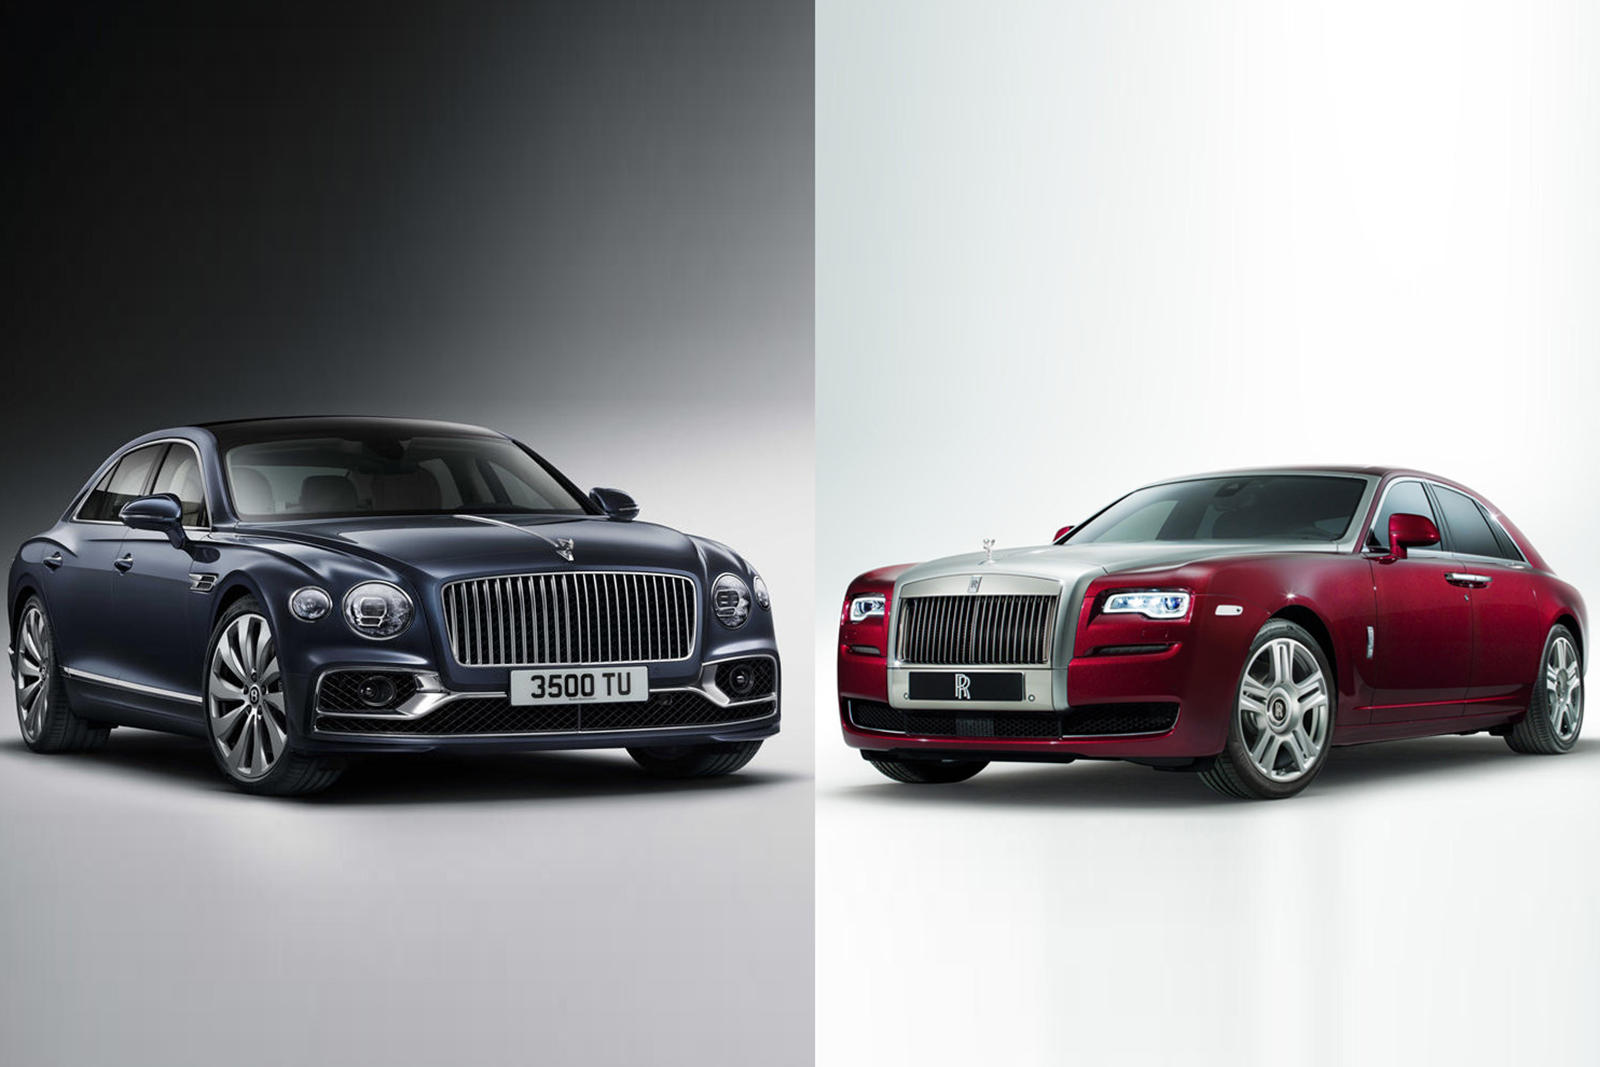 Bentley Flying Spur Vs Rolls Royce Ghost Which Is The Ultimate Uber Luxury Sedan Carbuzz